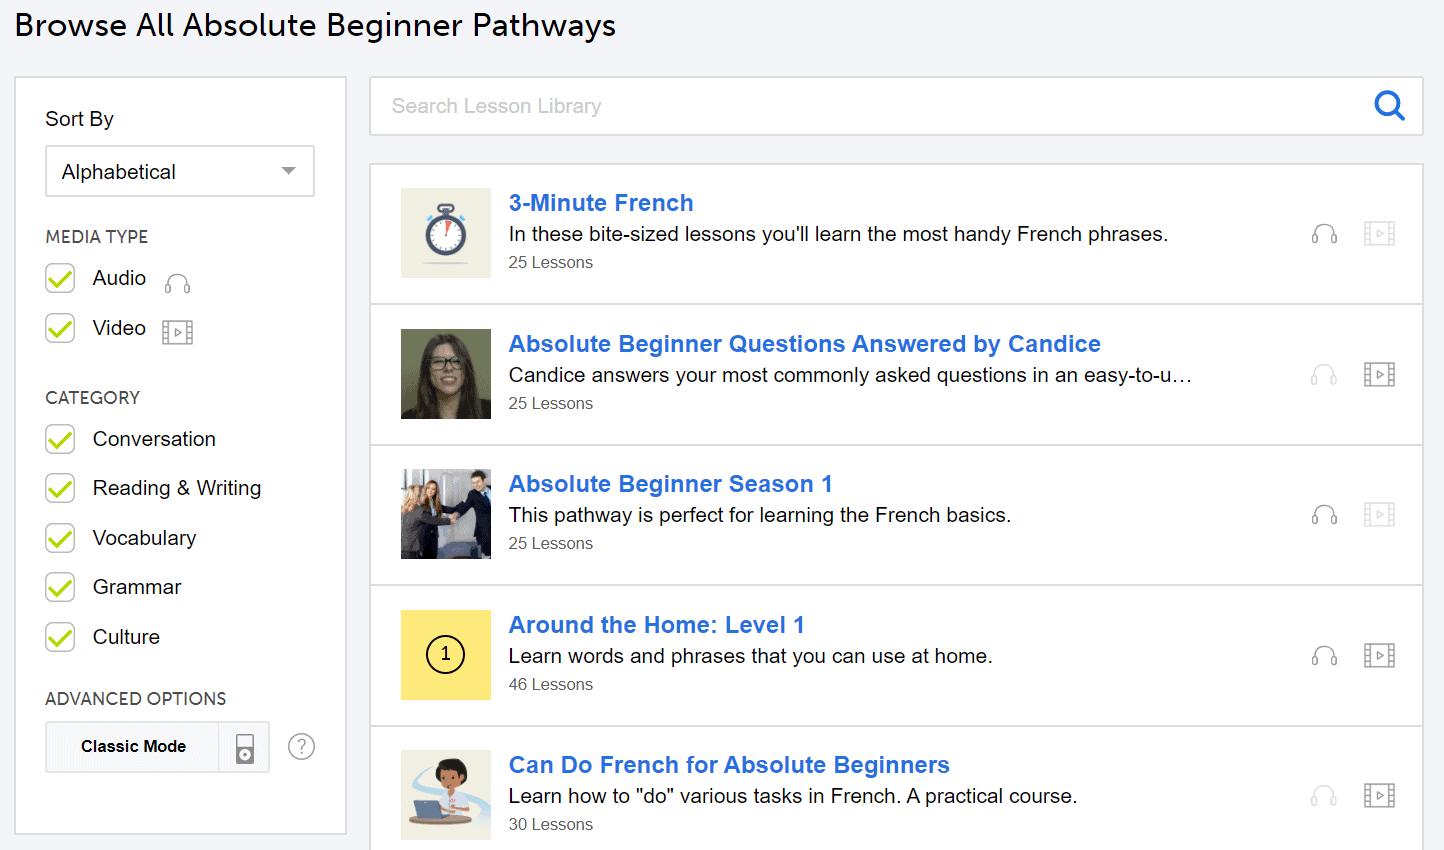 Absolute Beginner Pathways